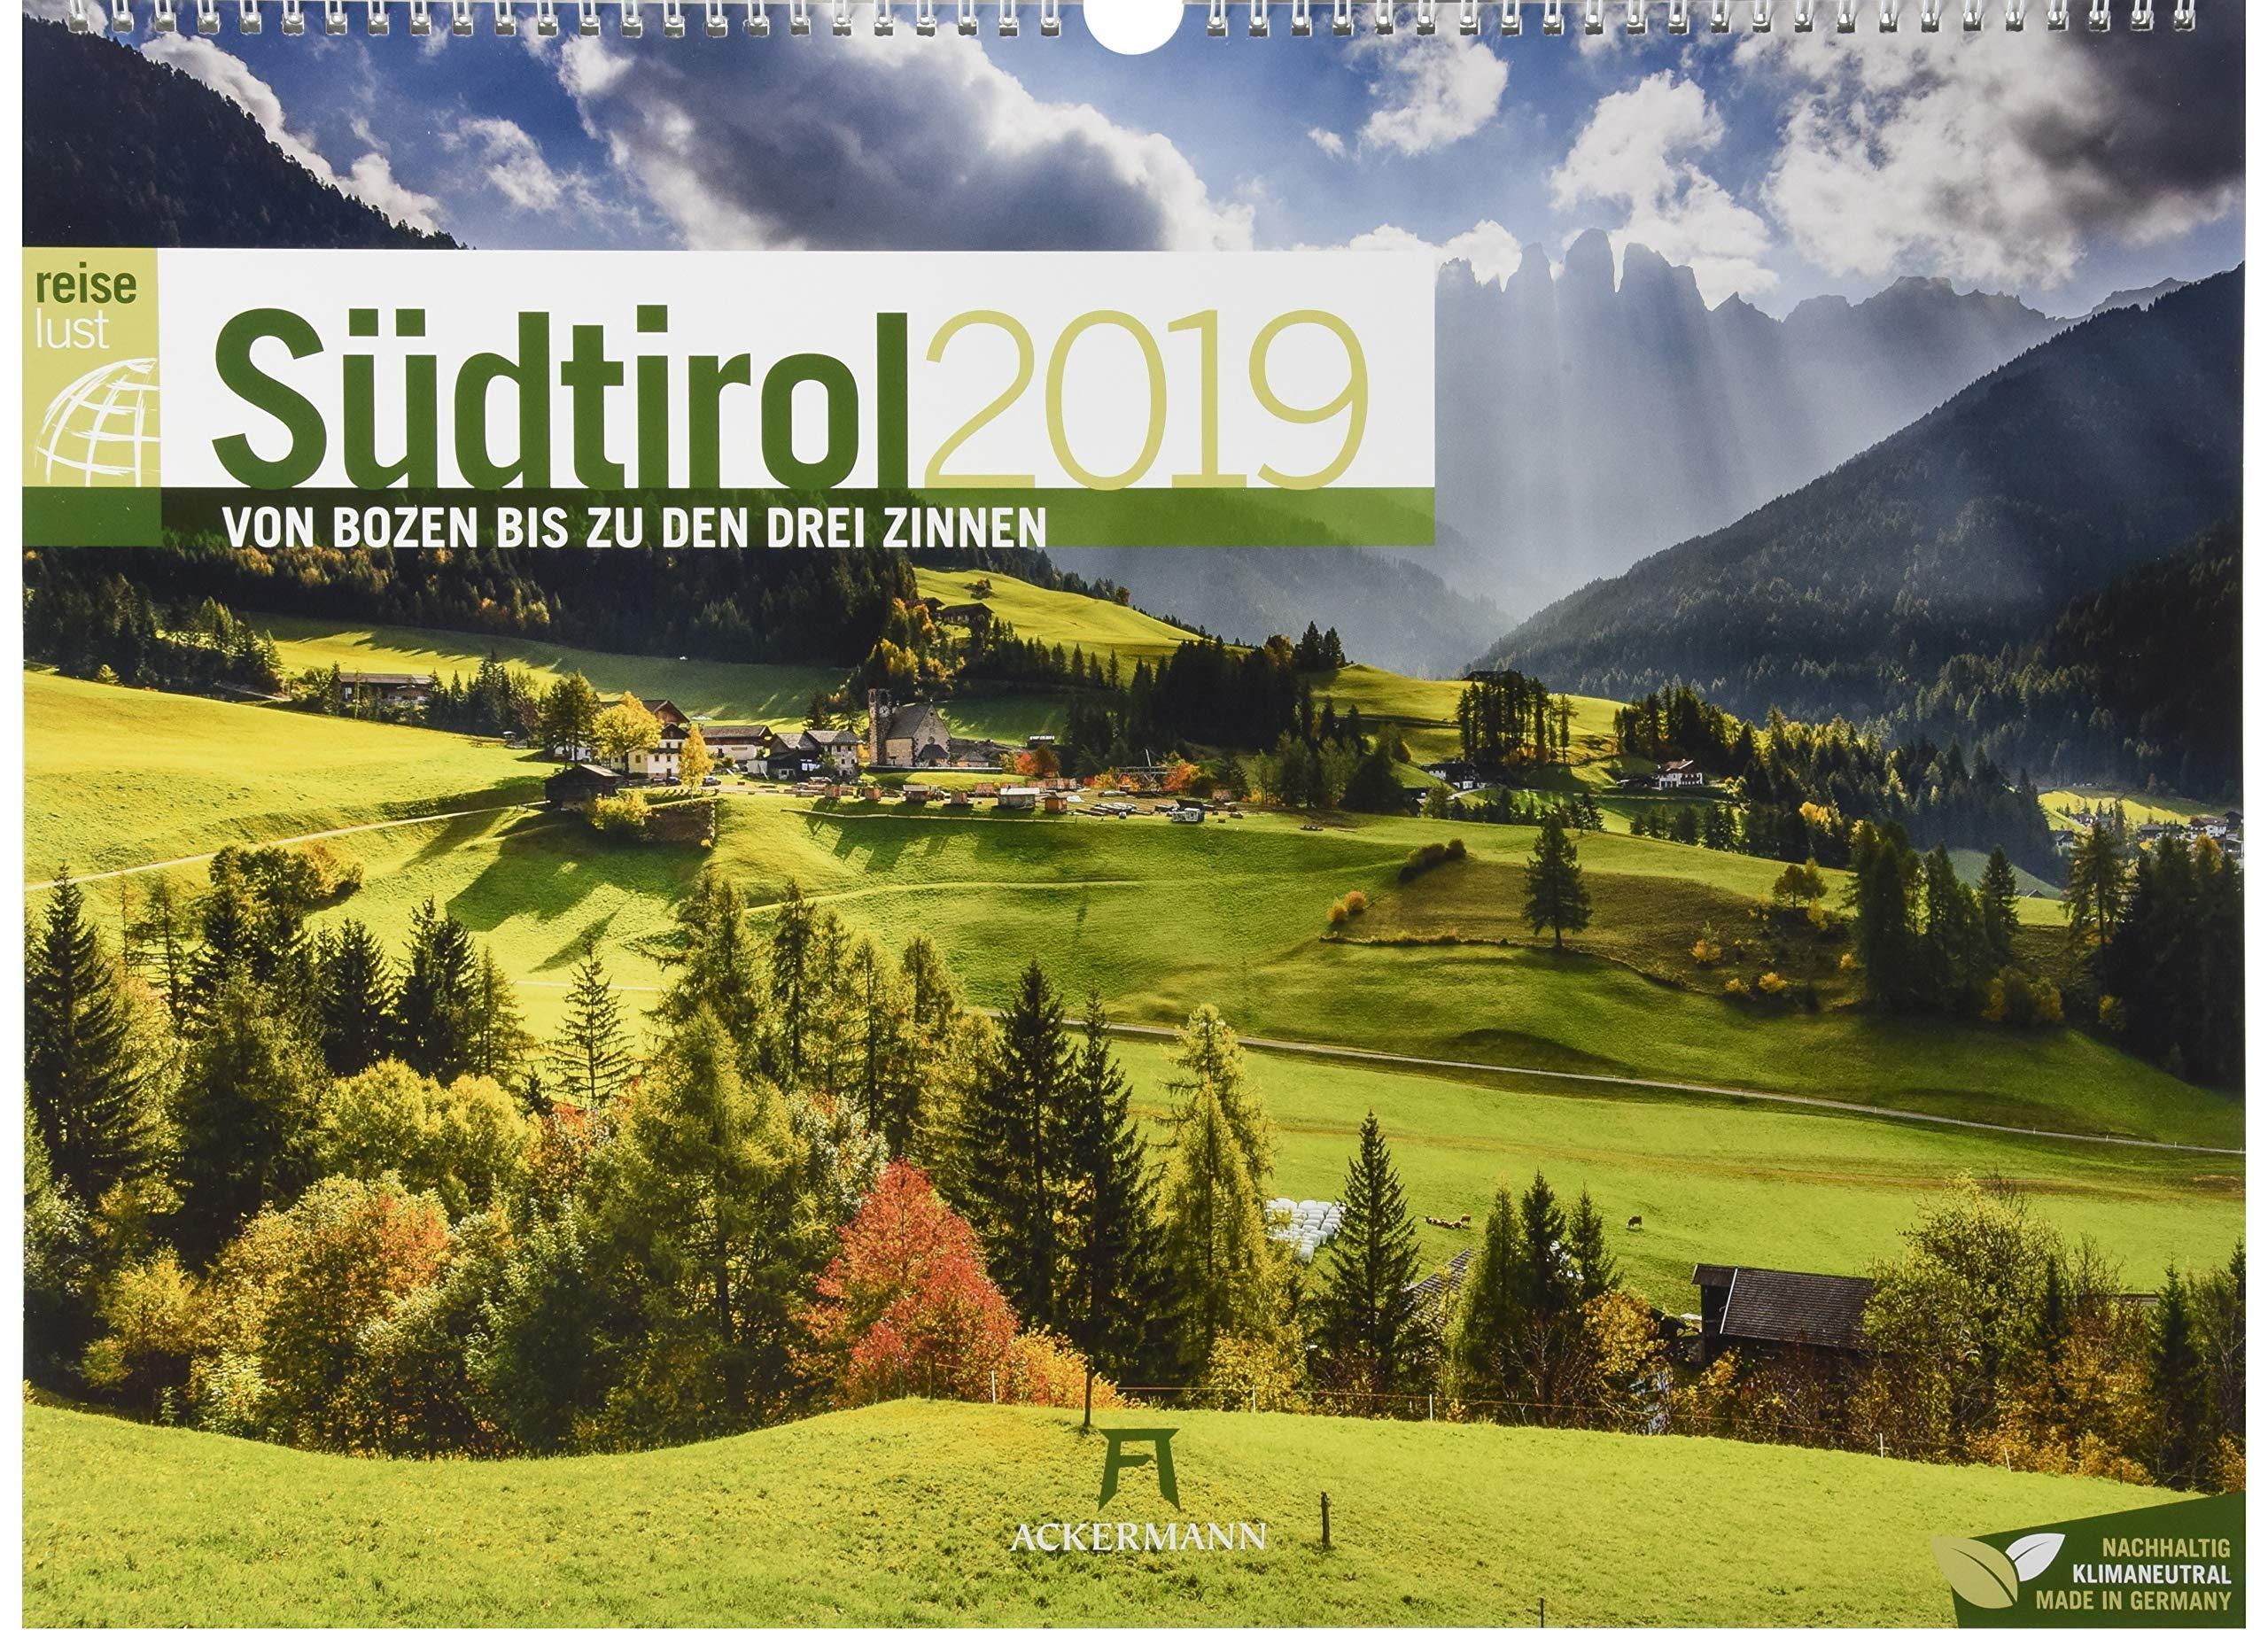 Südtirol ReiseLust 2019, Wandkalender im Querformat (45x33 cm) - Reisekalender Italien, Dolomiten mit Monatskalendarium (Tedesco) Calendario – 14 mag 2018 Ackermann Kunstverlag 3838429206 Bildbände Reisen